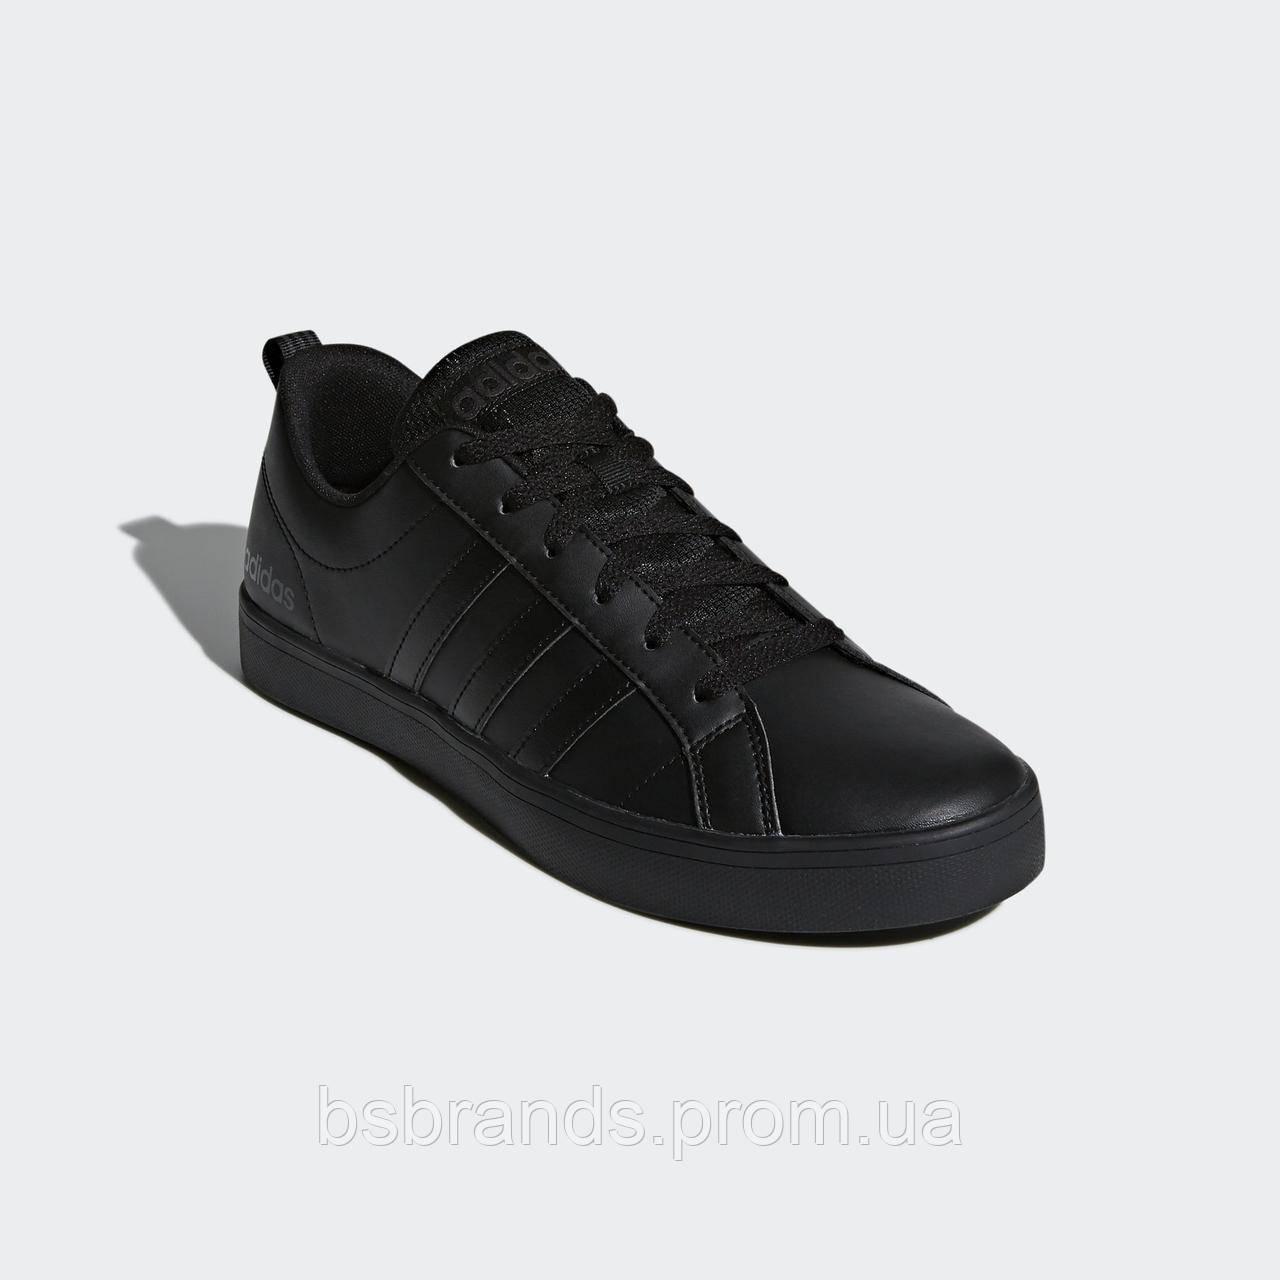 Мужские кроссовки adidas  VS Pace B44869